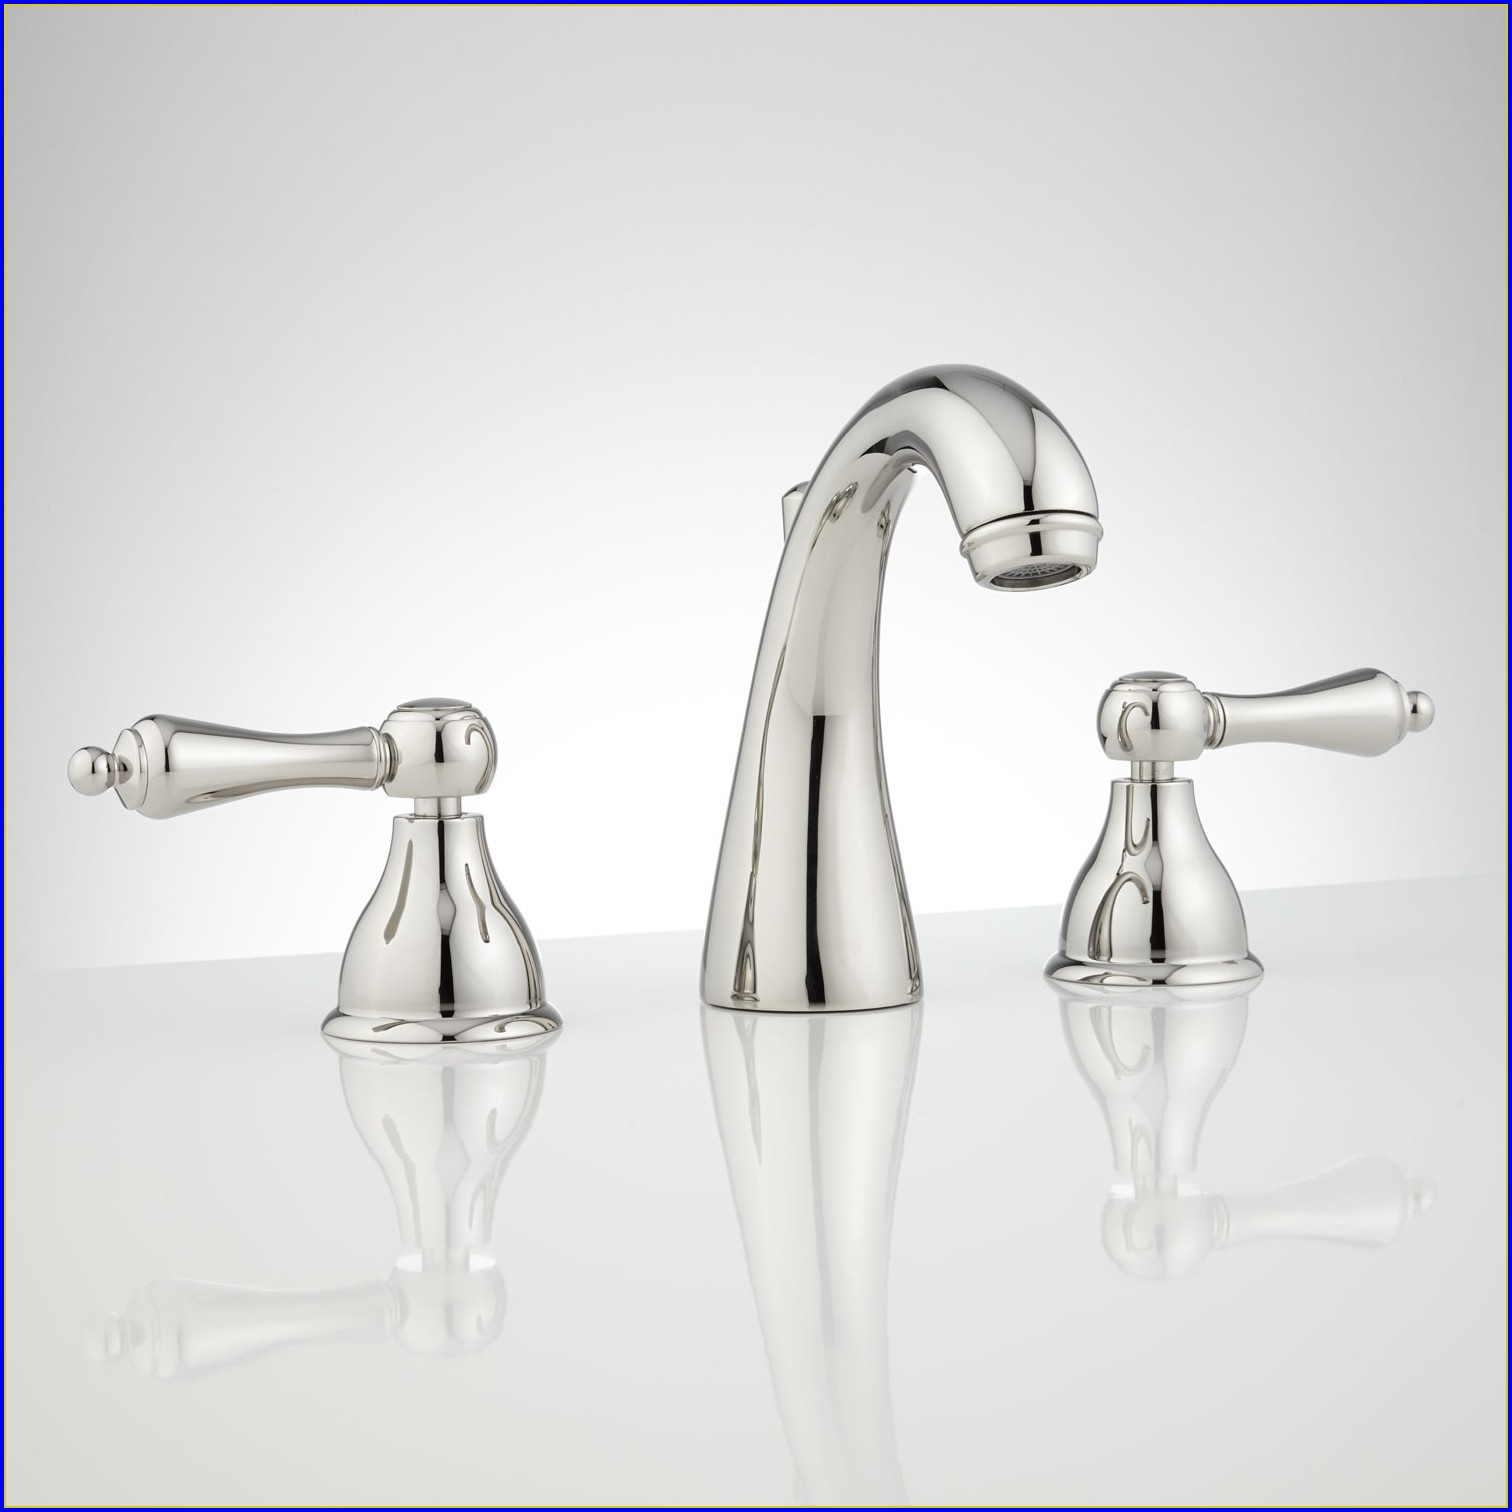 Widespread Bathroom Faucet Repair